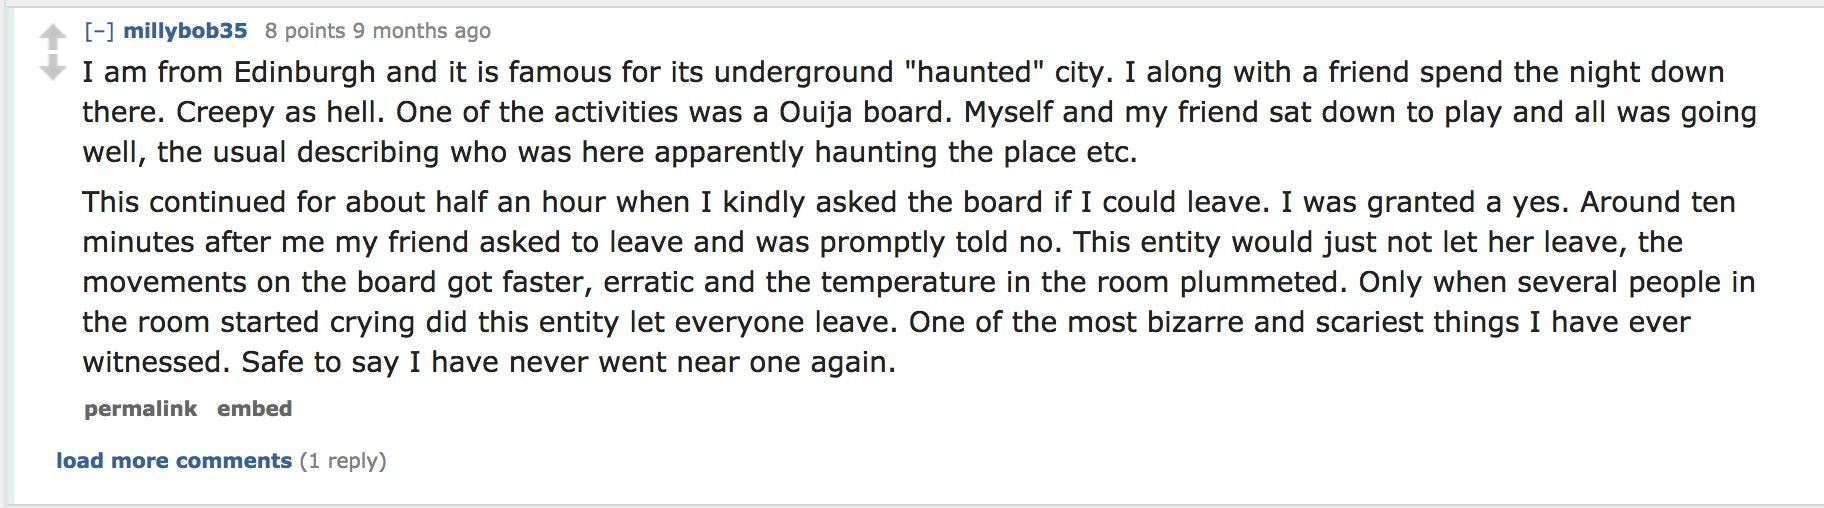 10 Creepy Ouija Board Stories That Will Make You Lose Sleep